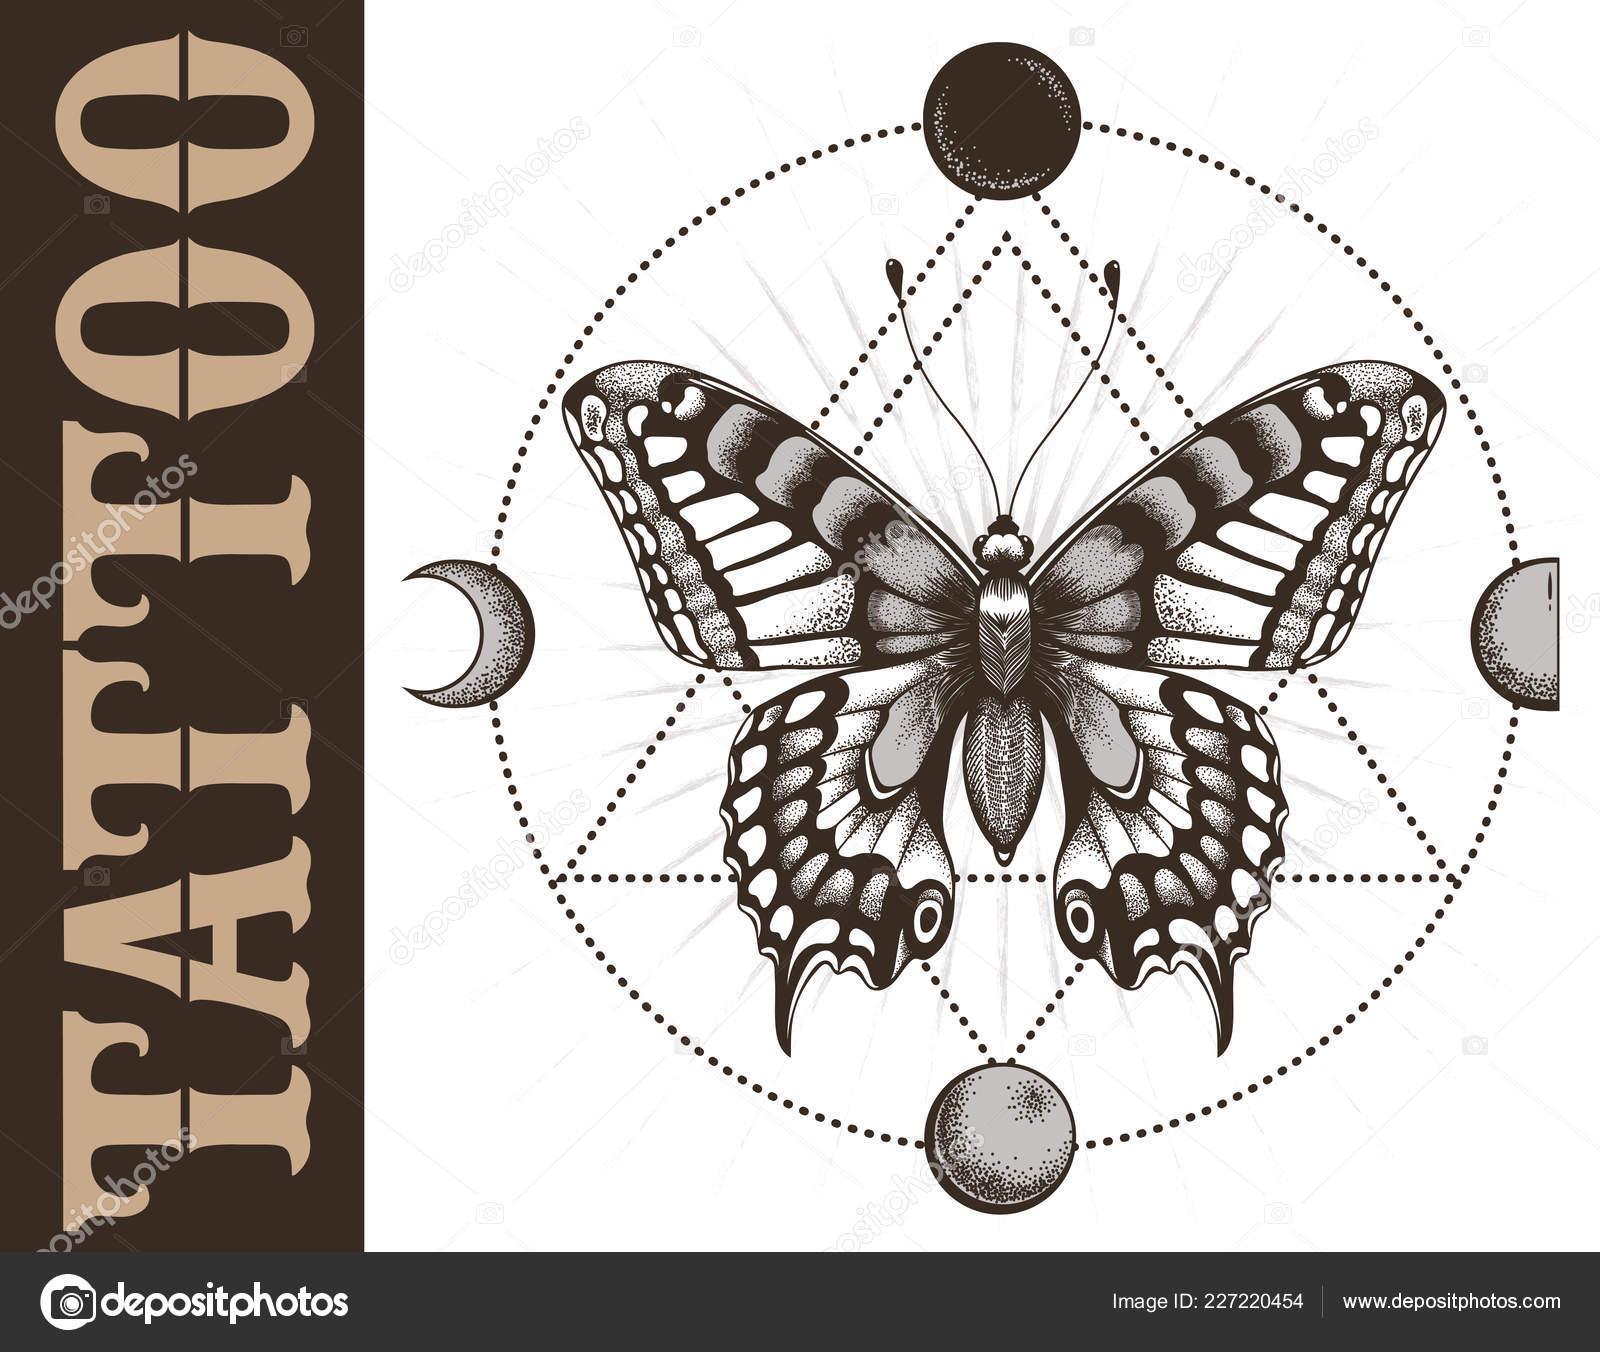 Banniere Ecole Tatouage Papillon Geometrie Triangle Phases Lune